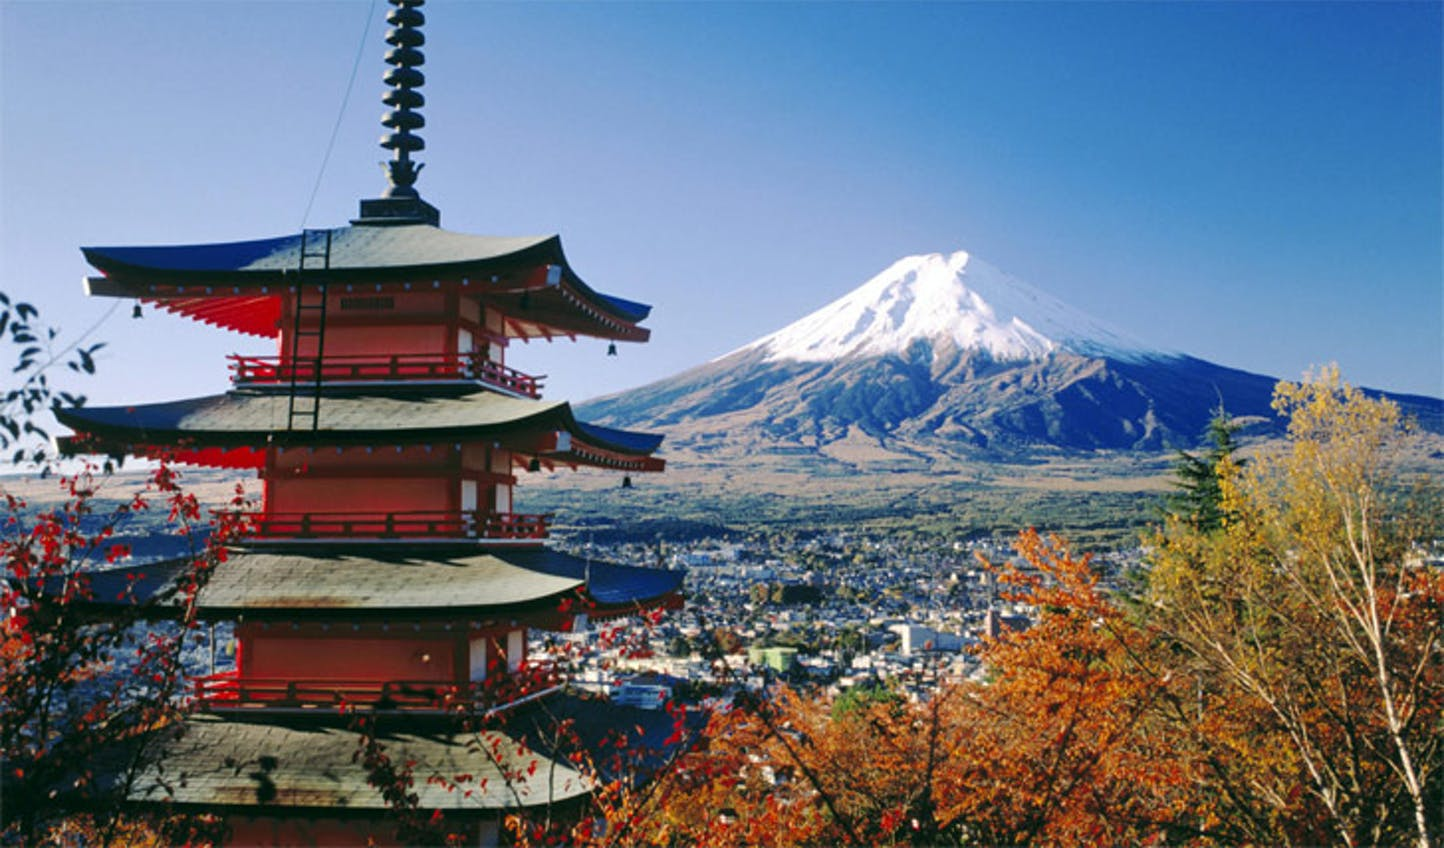 The iconic Mount Fuji